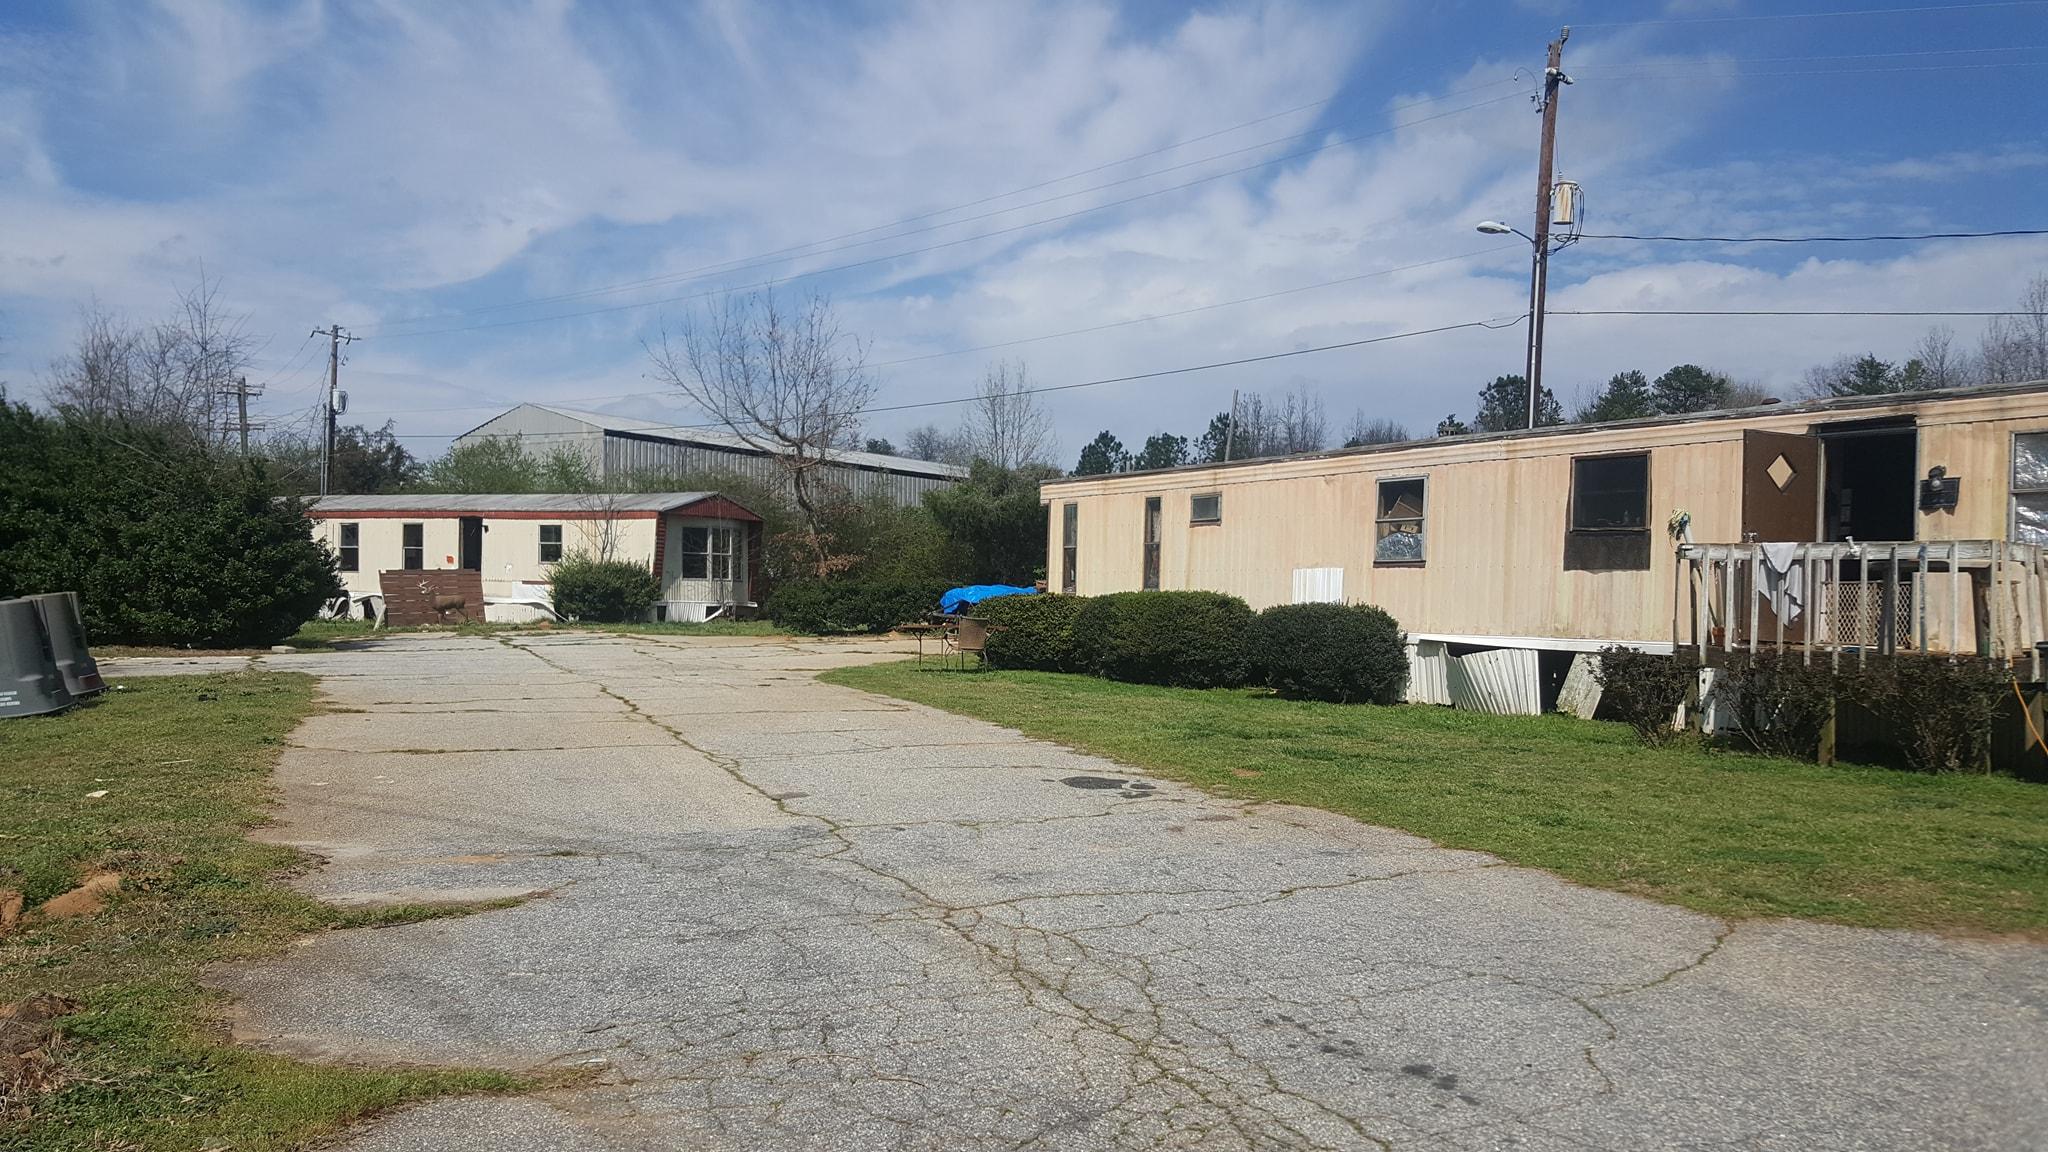 Threlkeld Demolition, LLC